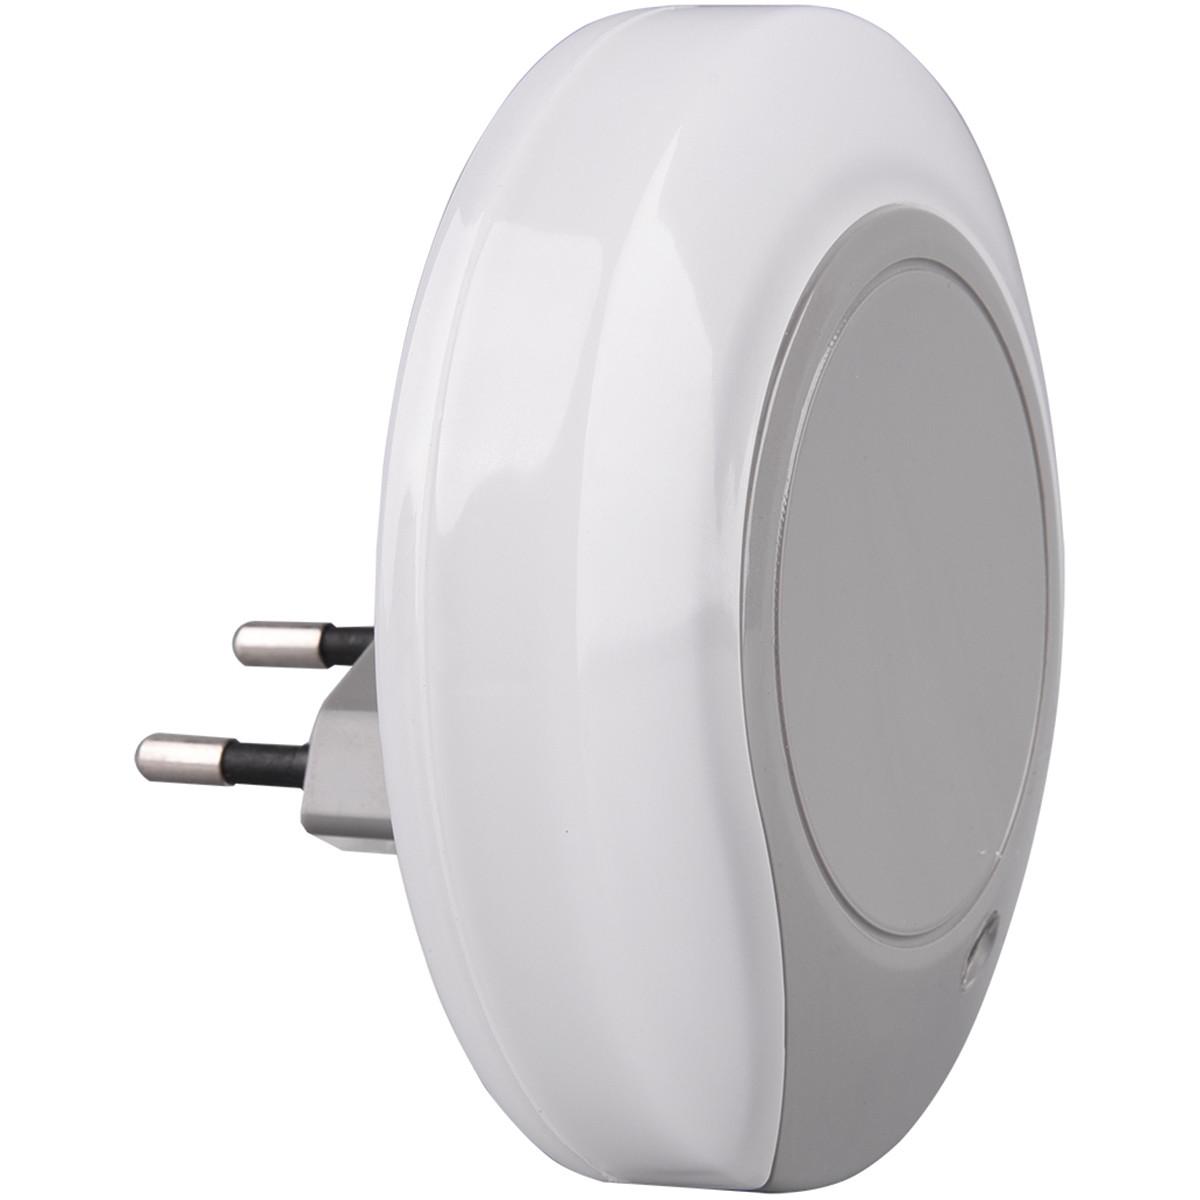 Stekkerlamp Lamp - Stekkerspot - Trion Jiko - 4W - Warm Wit 3000K - Rond - Mat Grijs - Kunststof